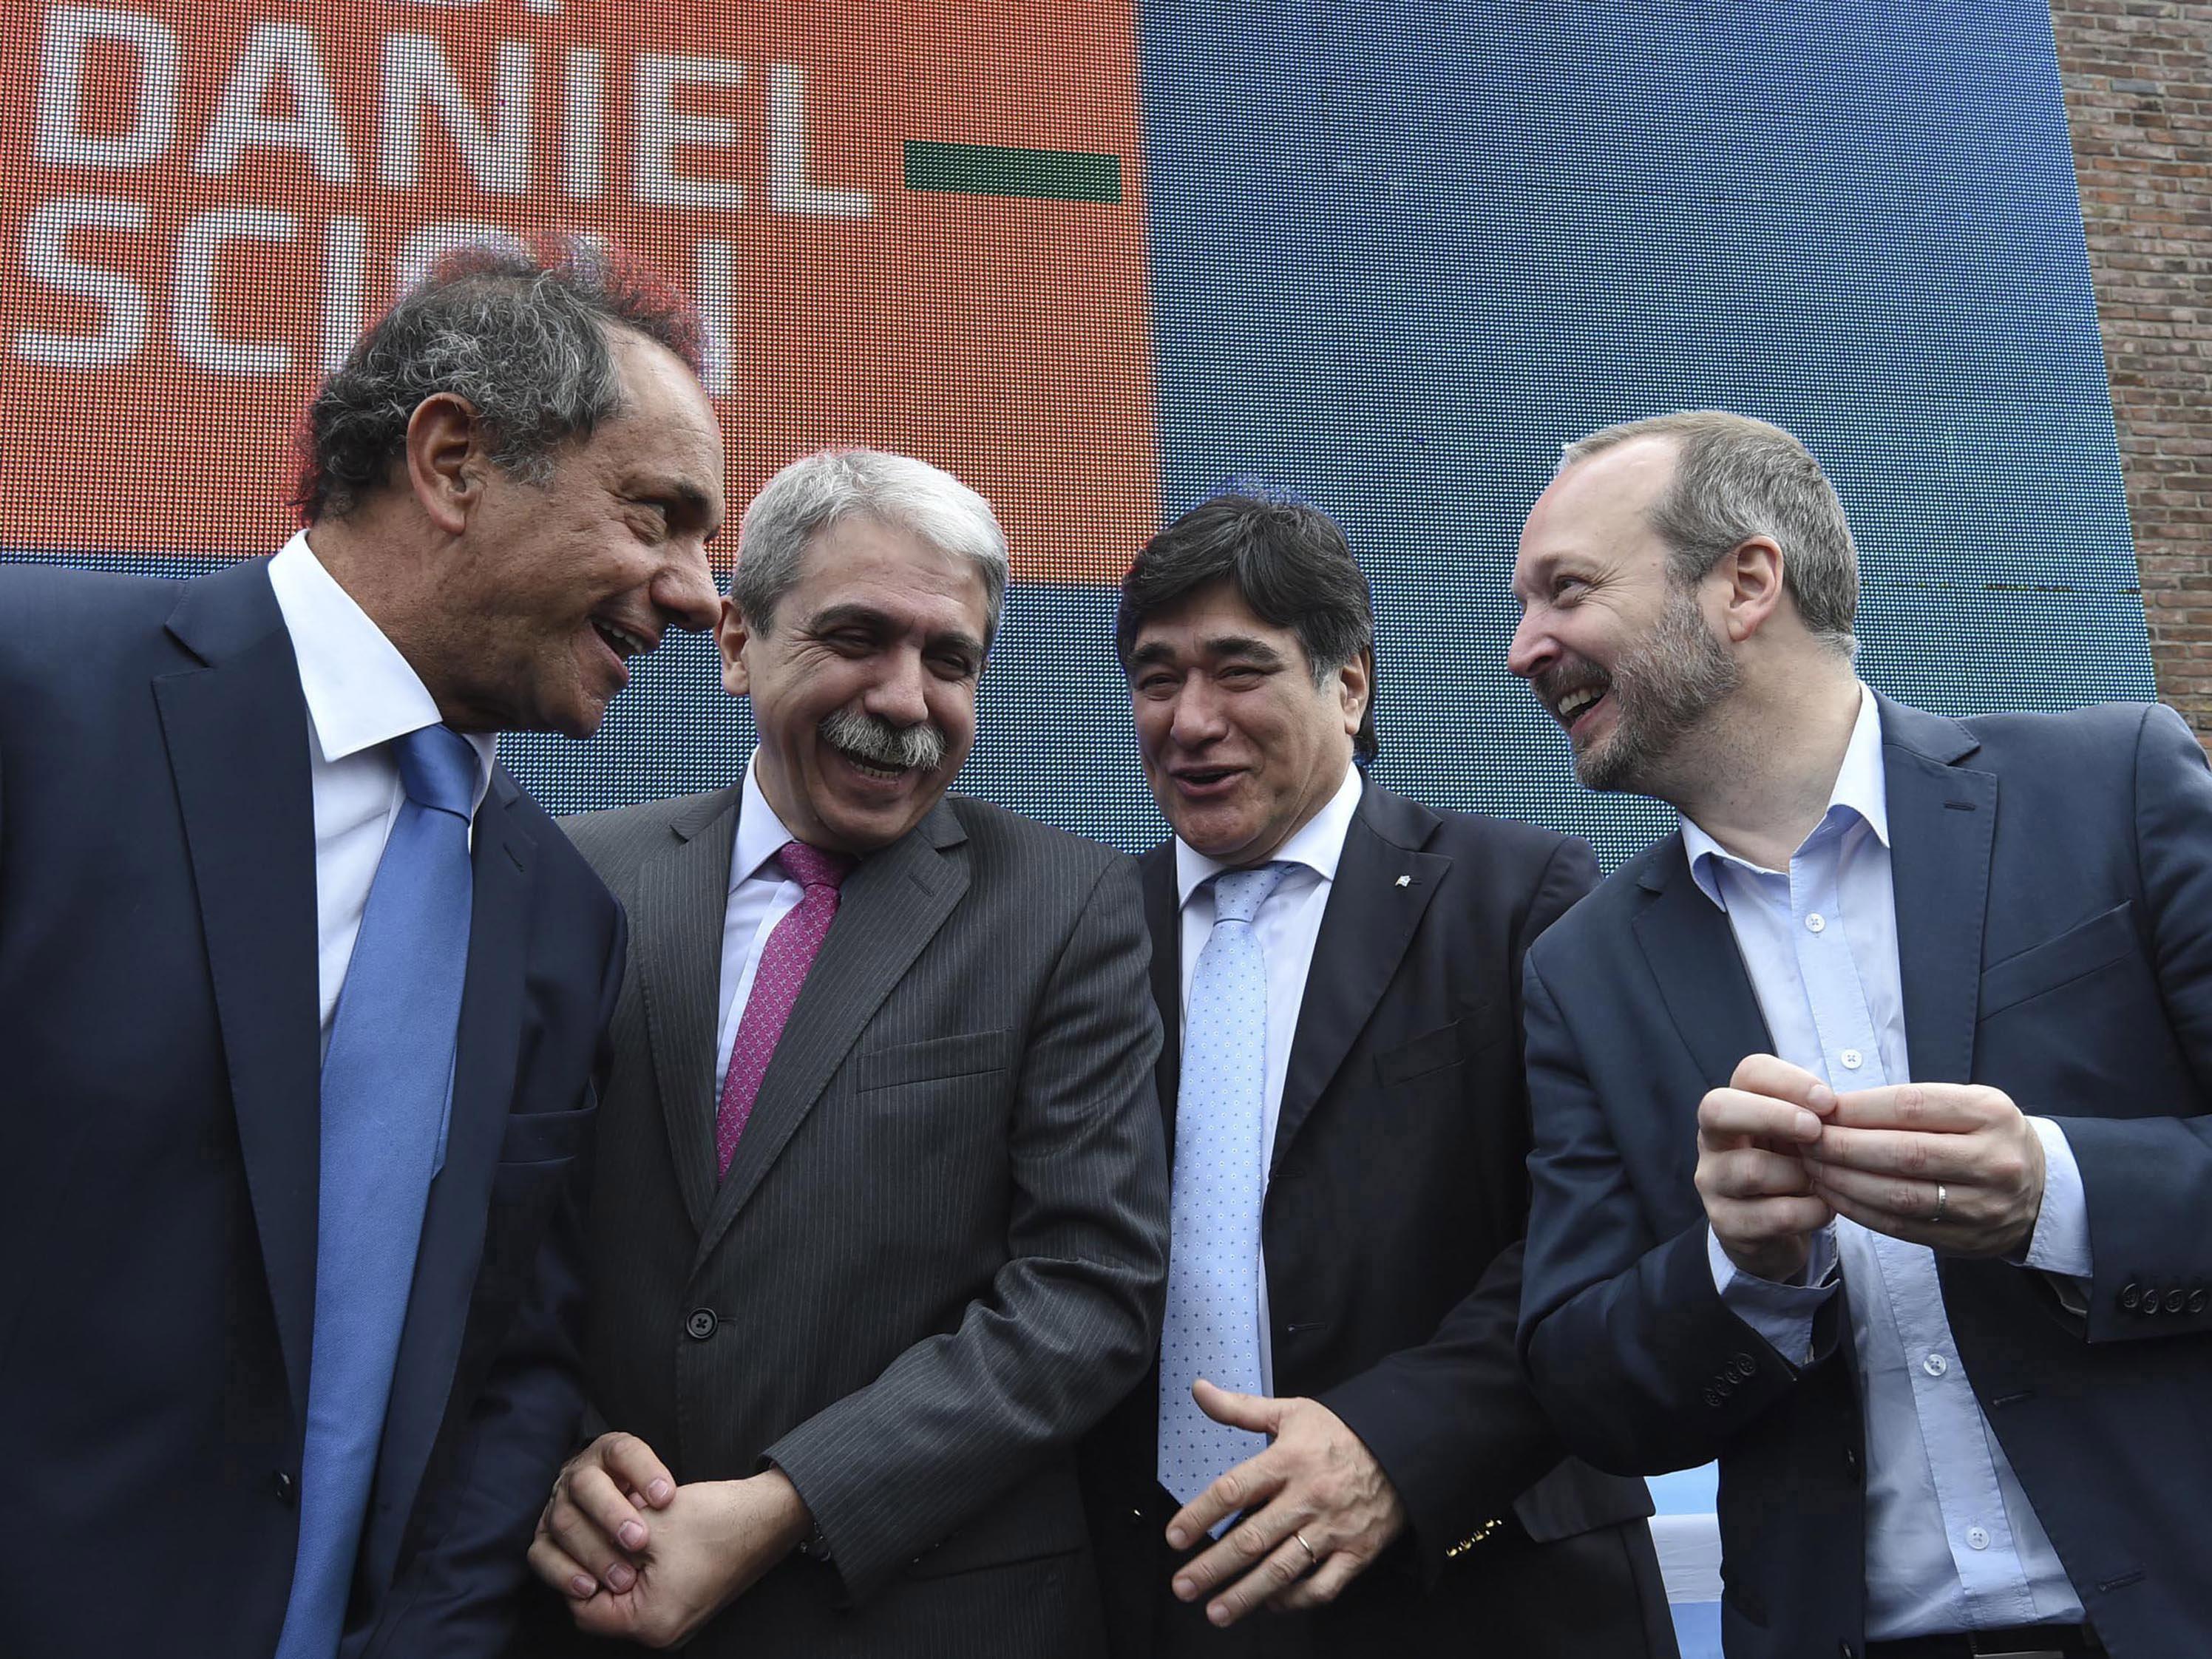 05/10/2015, DANIEL SCIOLI, ANIBAL FERNANDEZ, CARLOS ZANINI Y MARTIN SABATTELLA EN LA INAUGURACION DEL CENTRO OPERATIVO DE MONITOREO DE SAN MARTIN